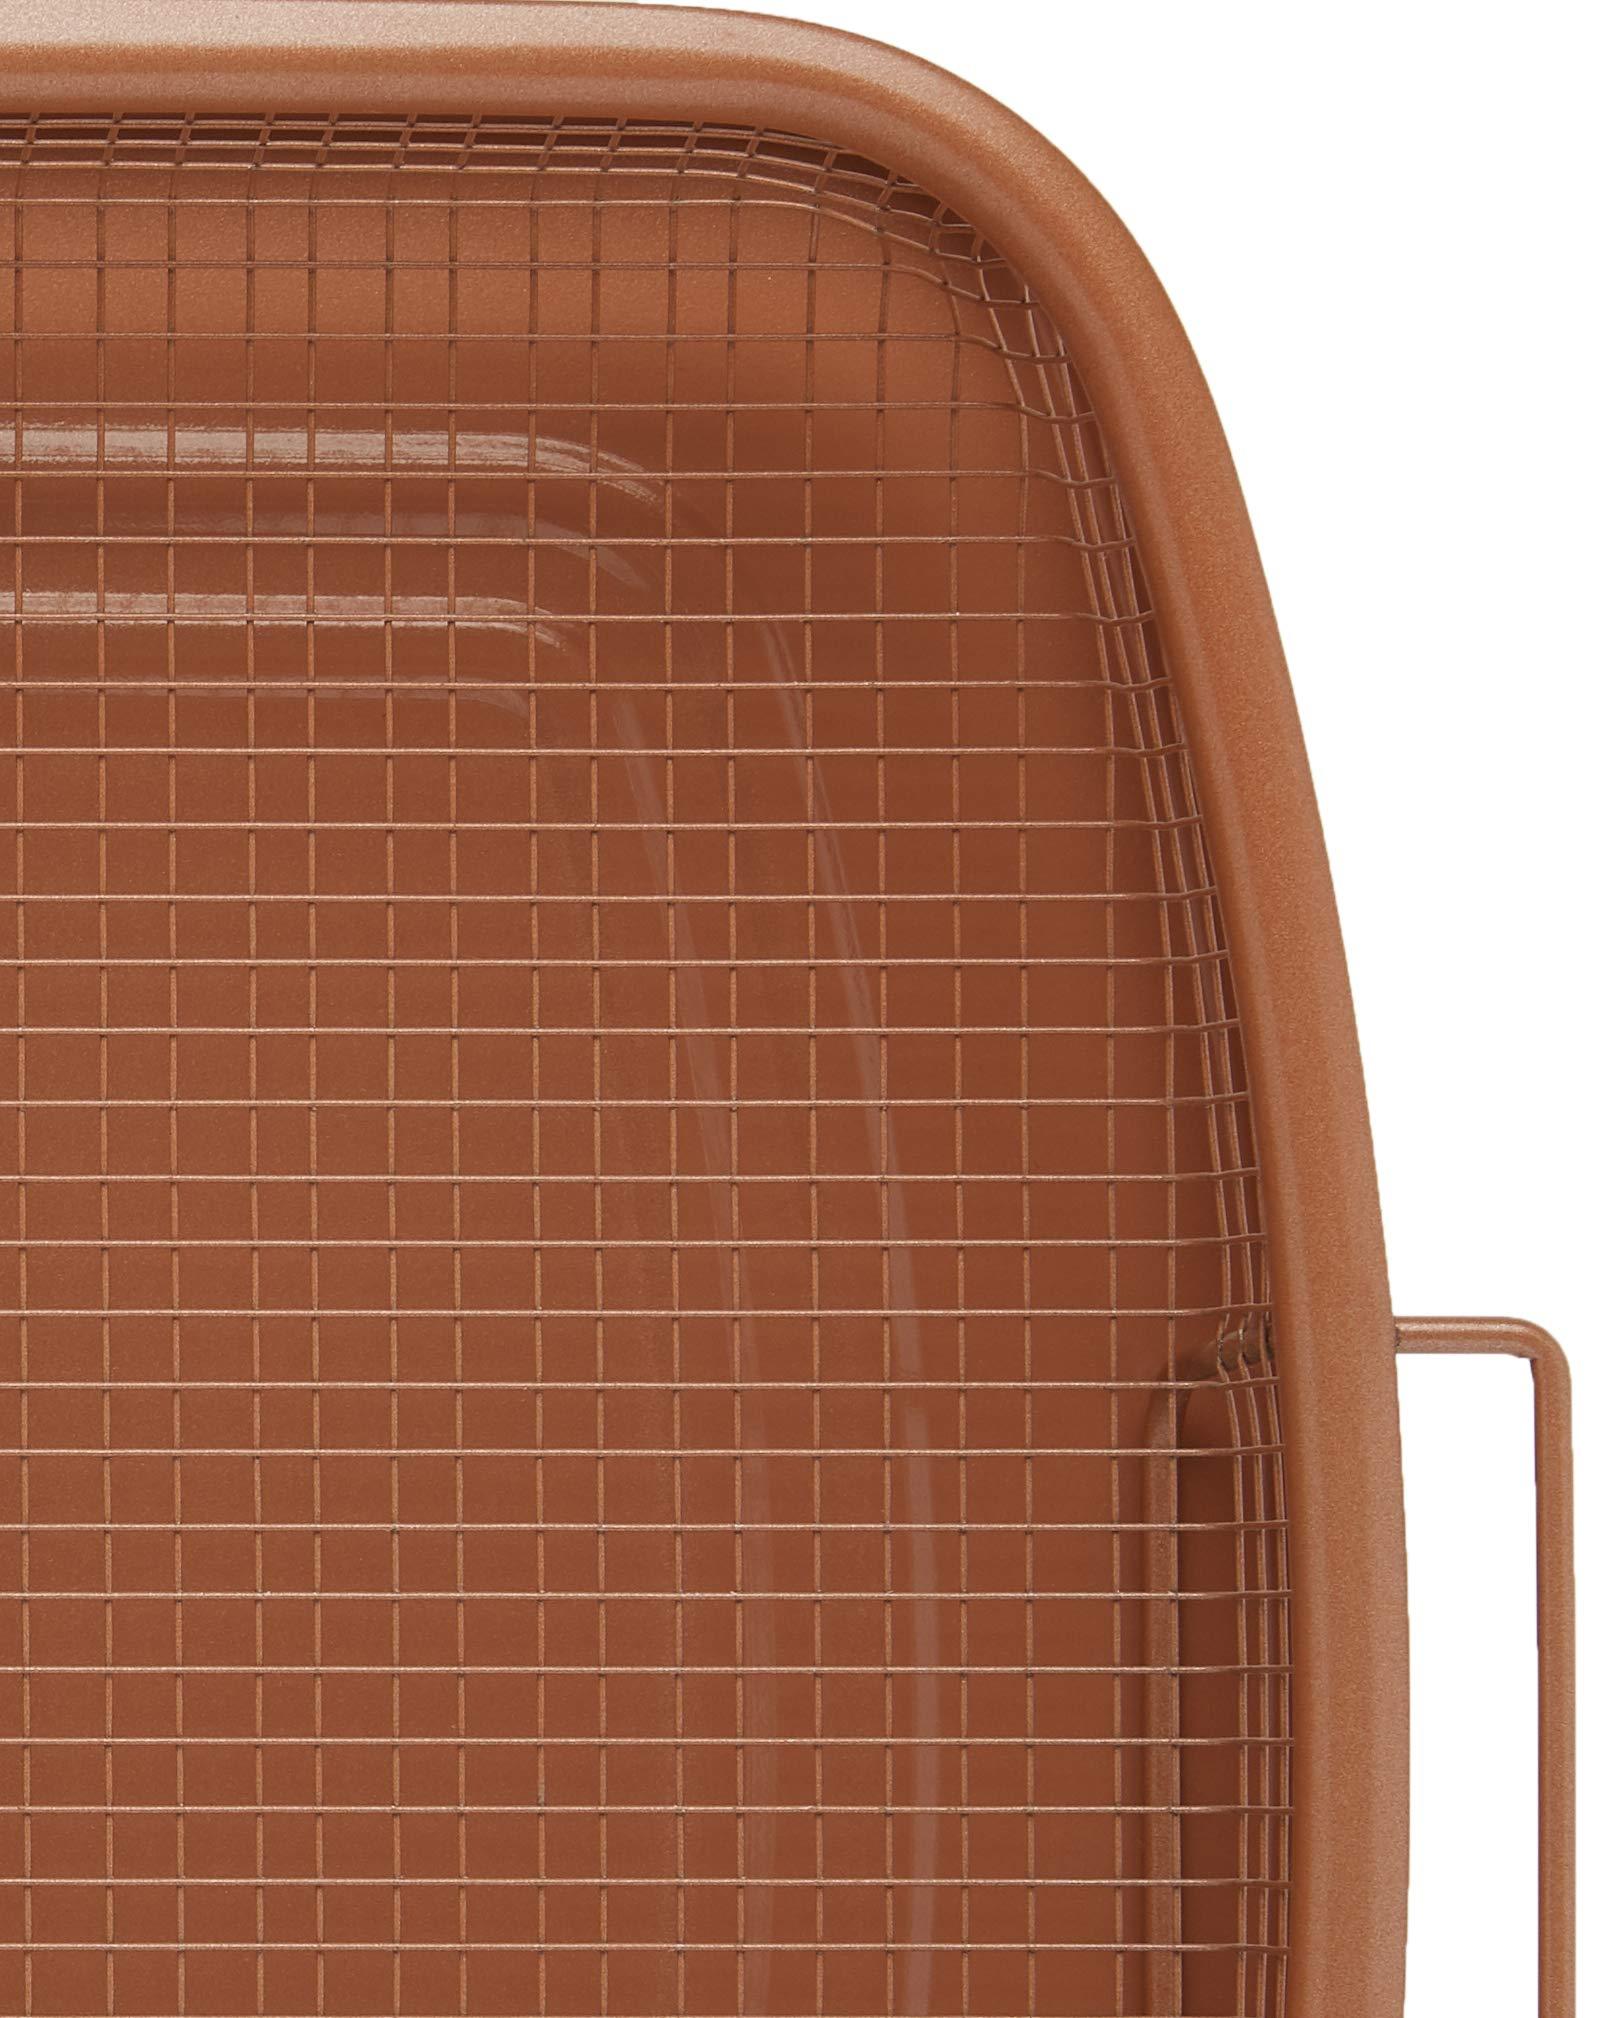 Gotham Steel 1683 Crisper tray, XXL, Brown by GOTHAM STEEL